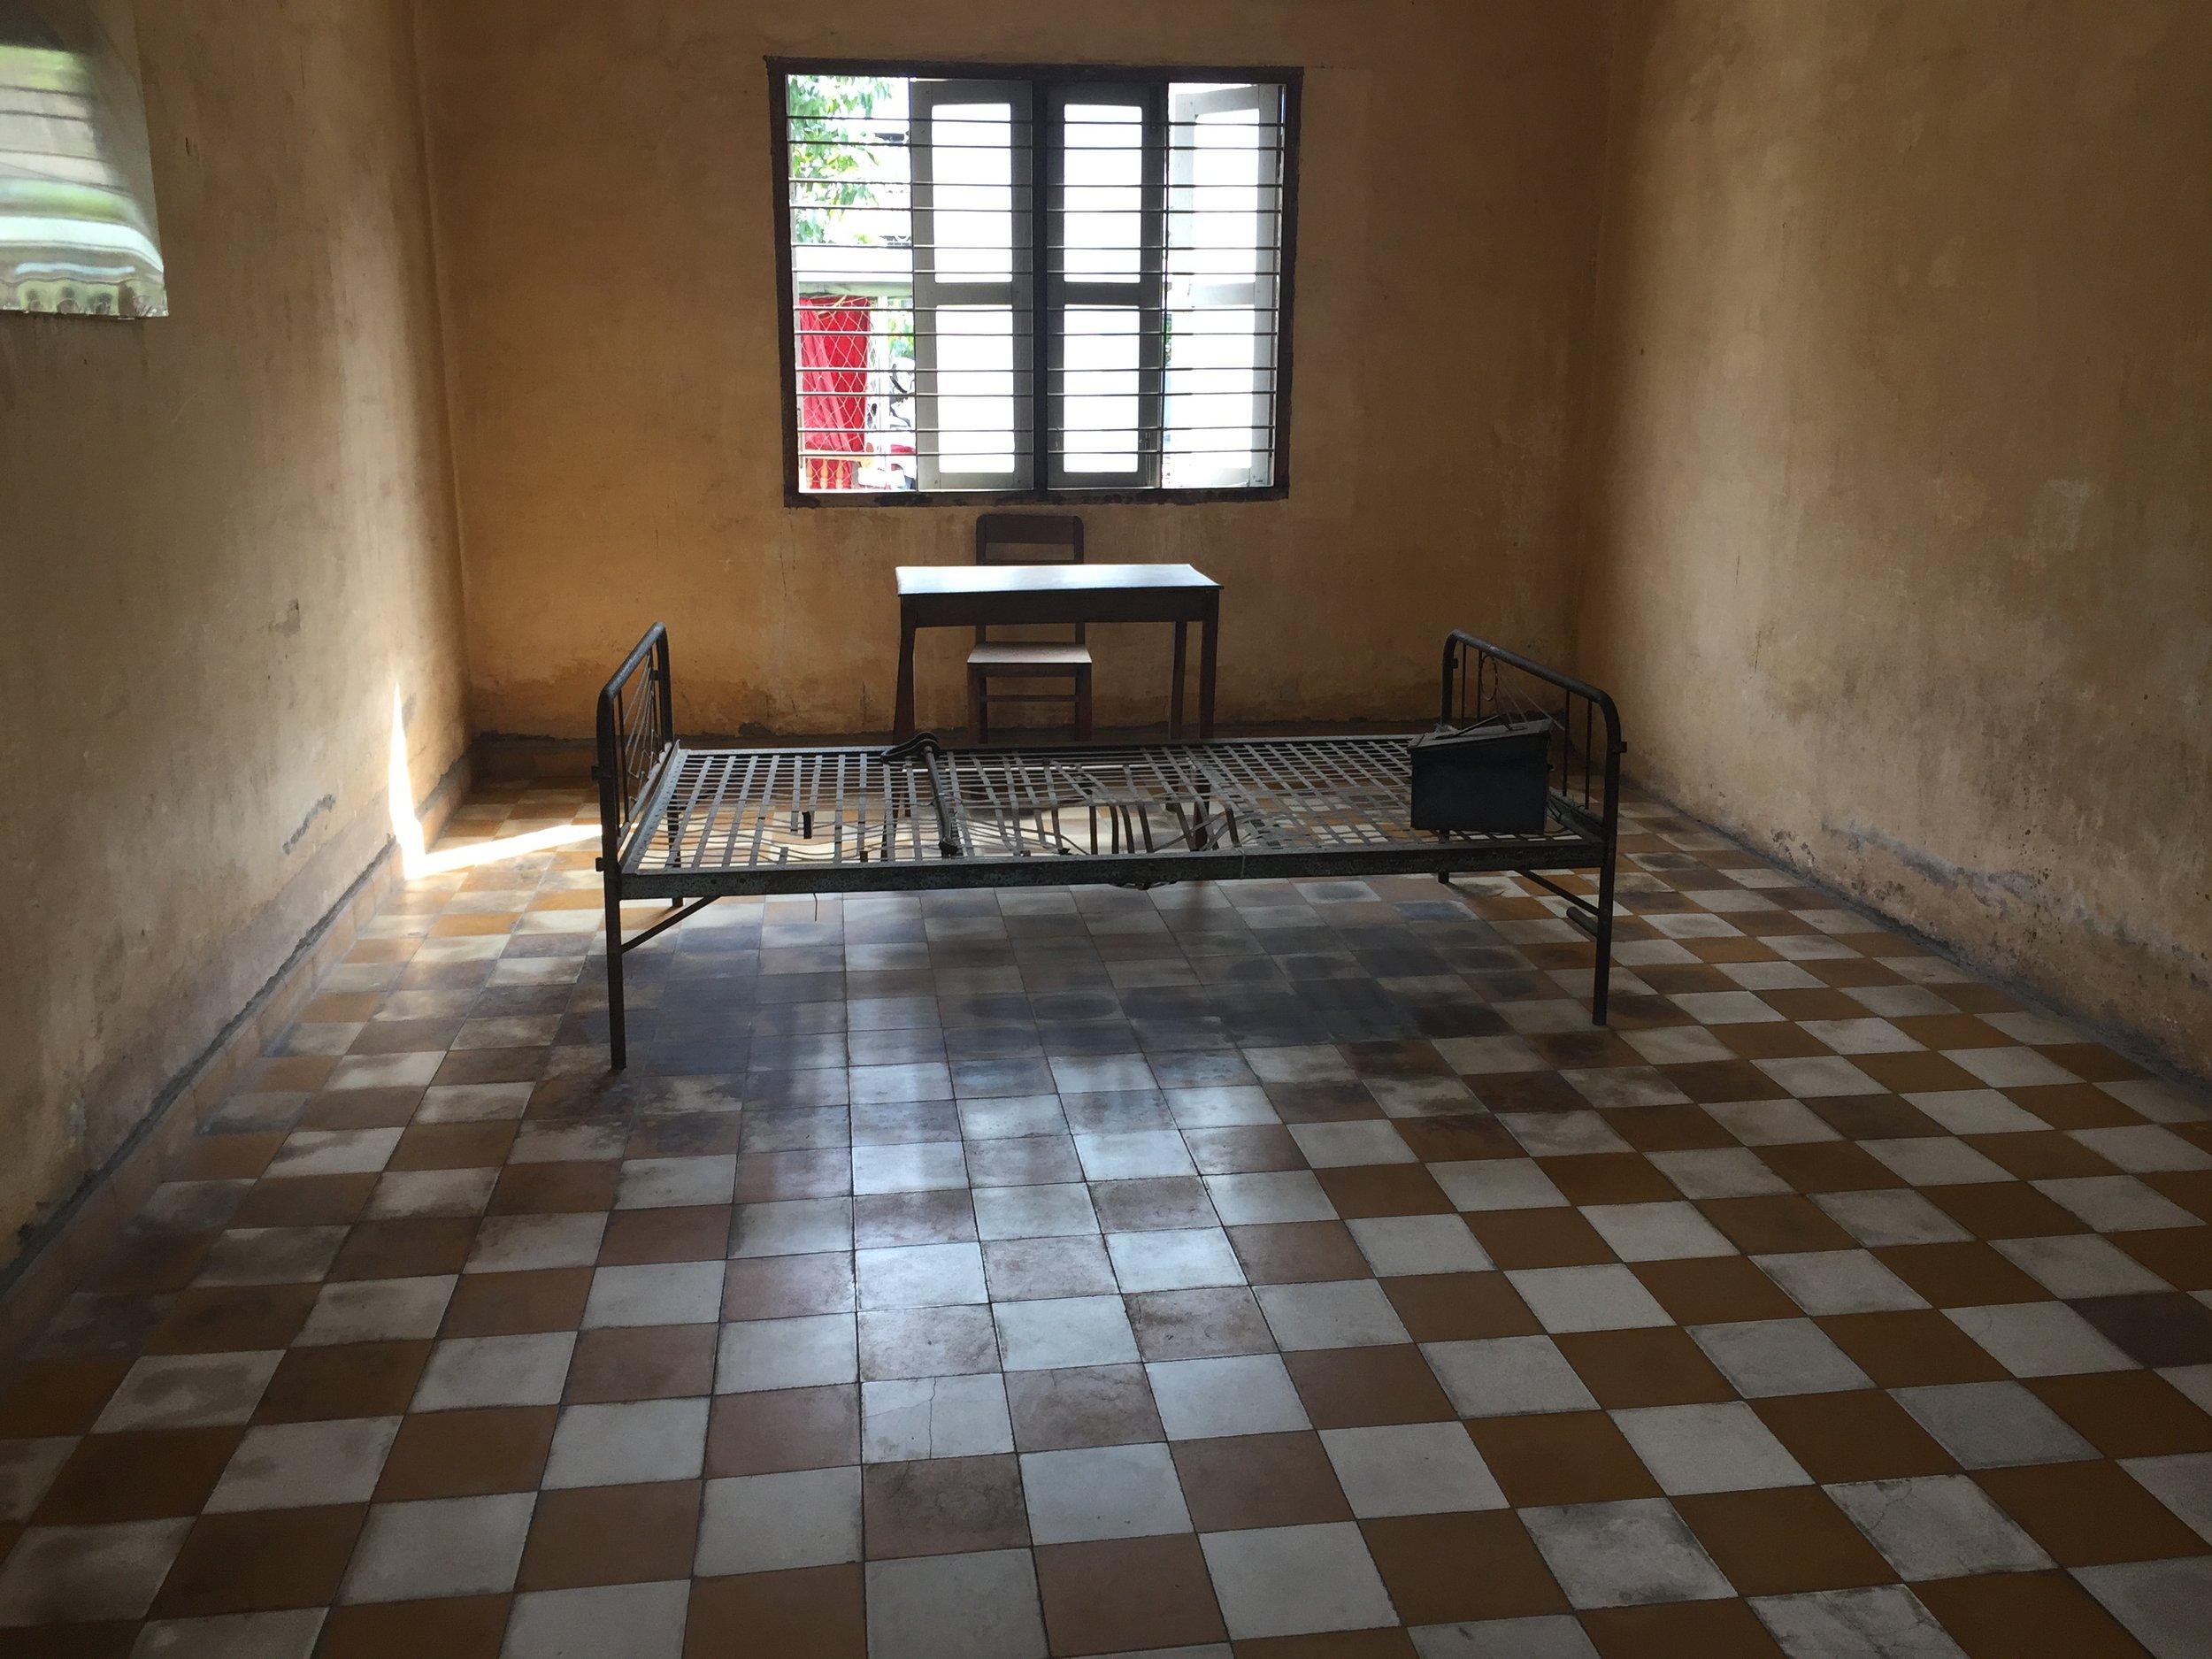 An interrogation room at S21 secret prison in Phnom Penh.